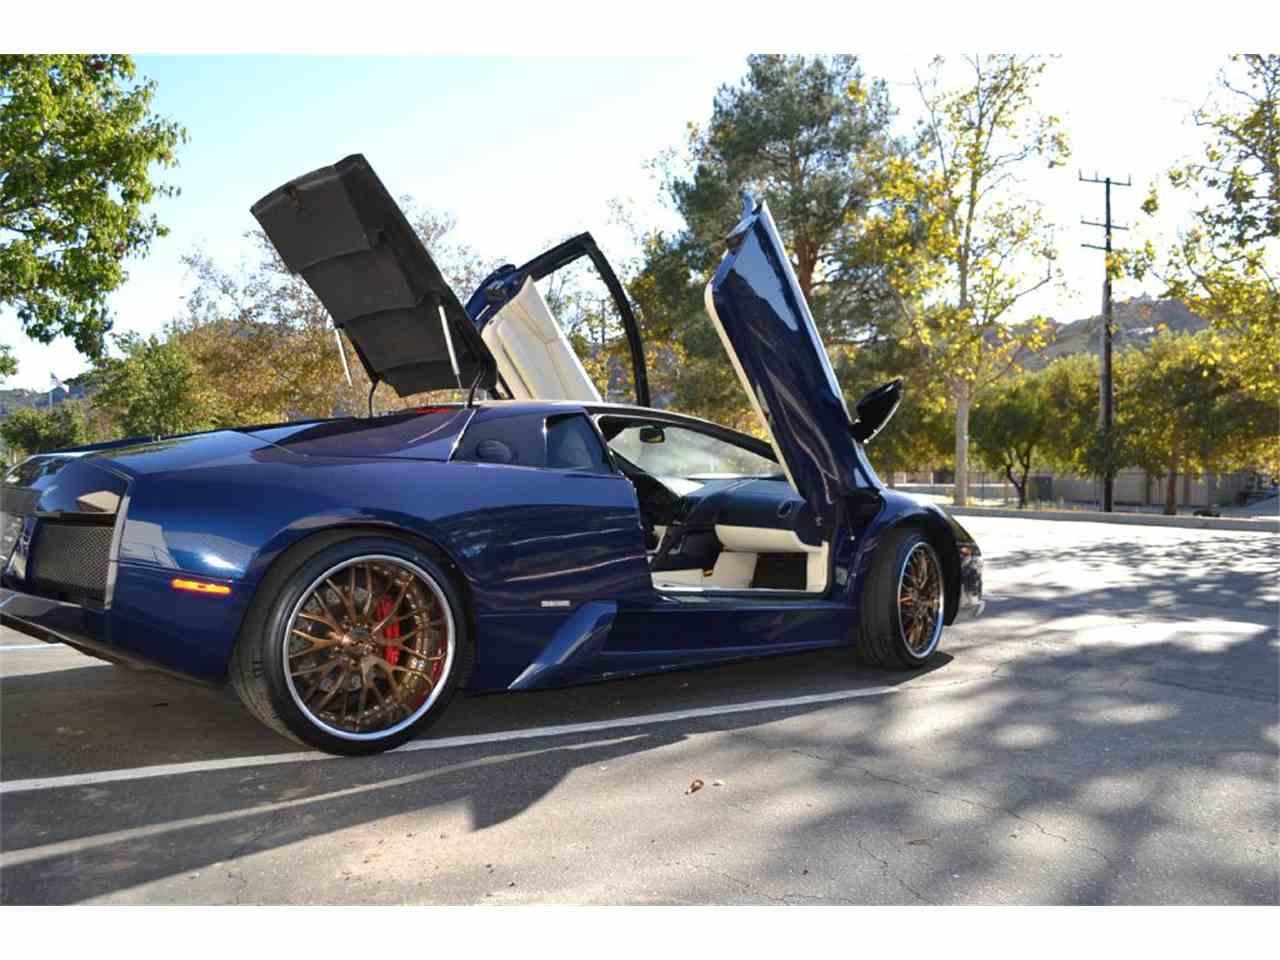 Large Picture of '04 Lamborghini Murcielago - $110,000.00 Offered by Fortunauto 13 LLC - LVJ1